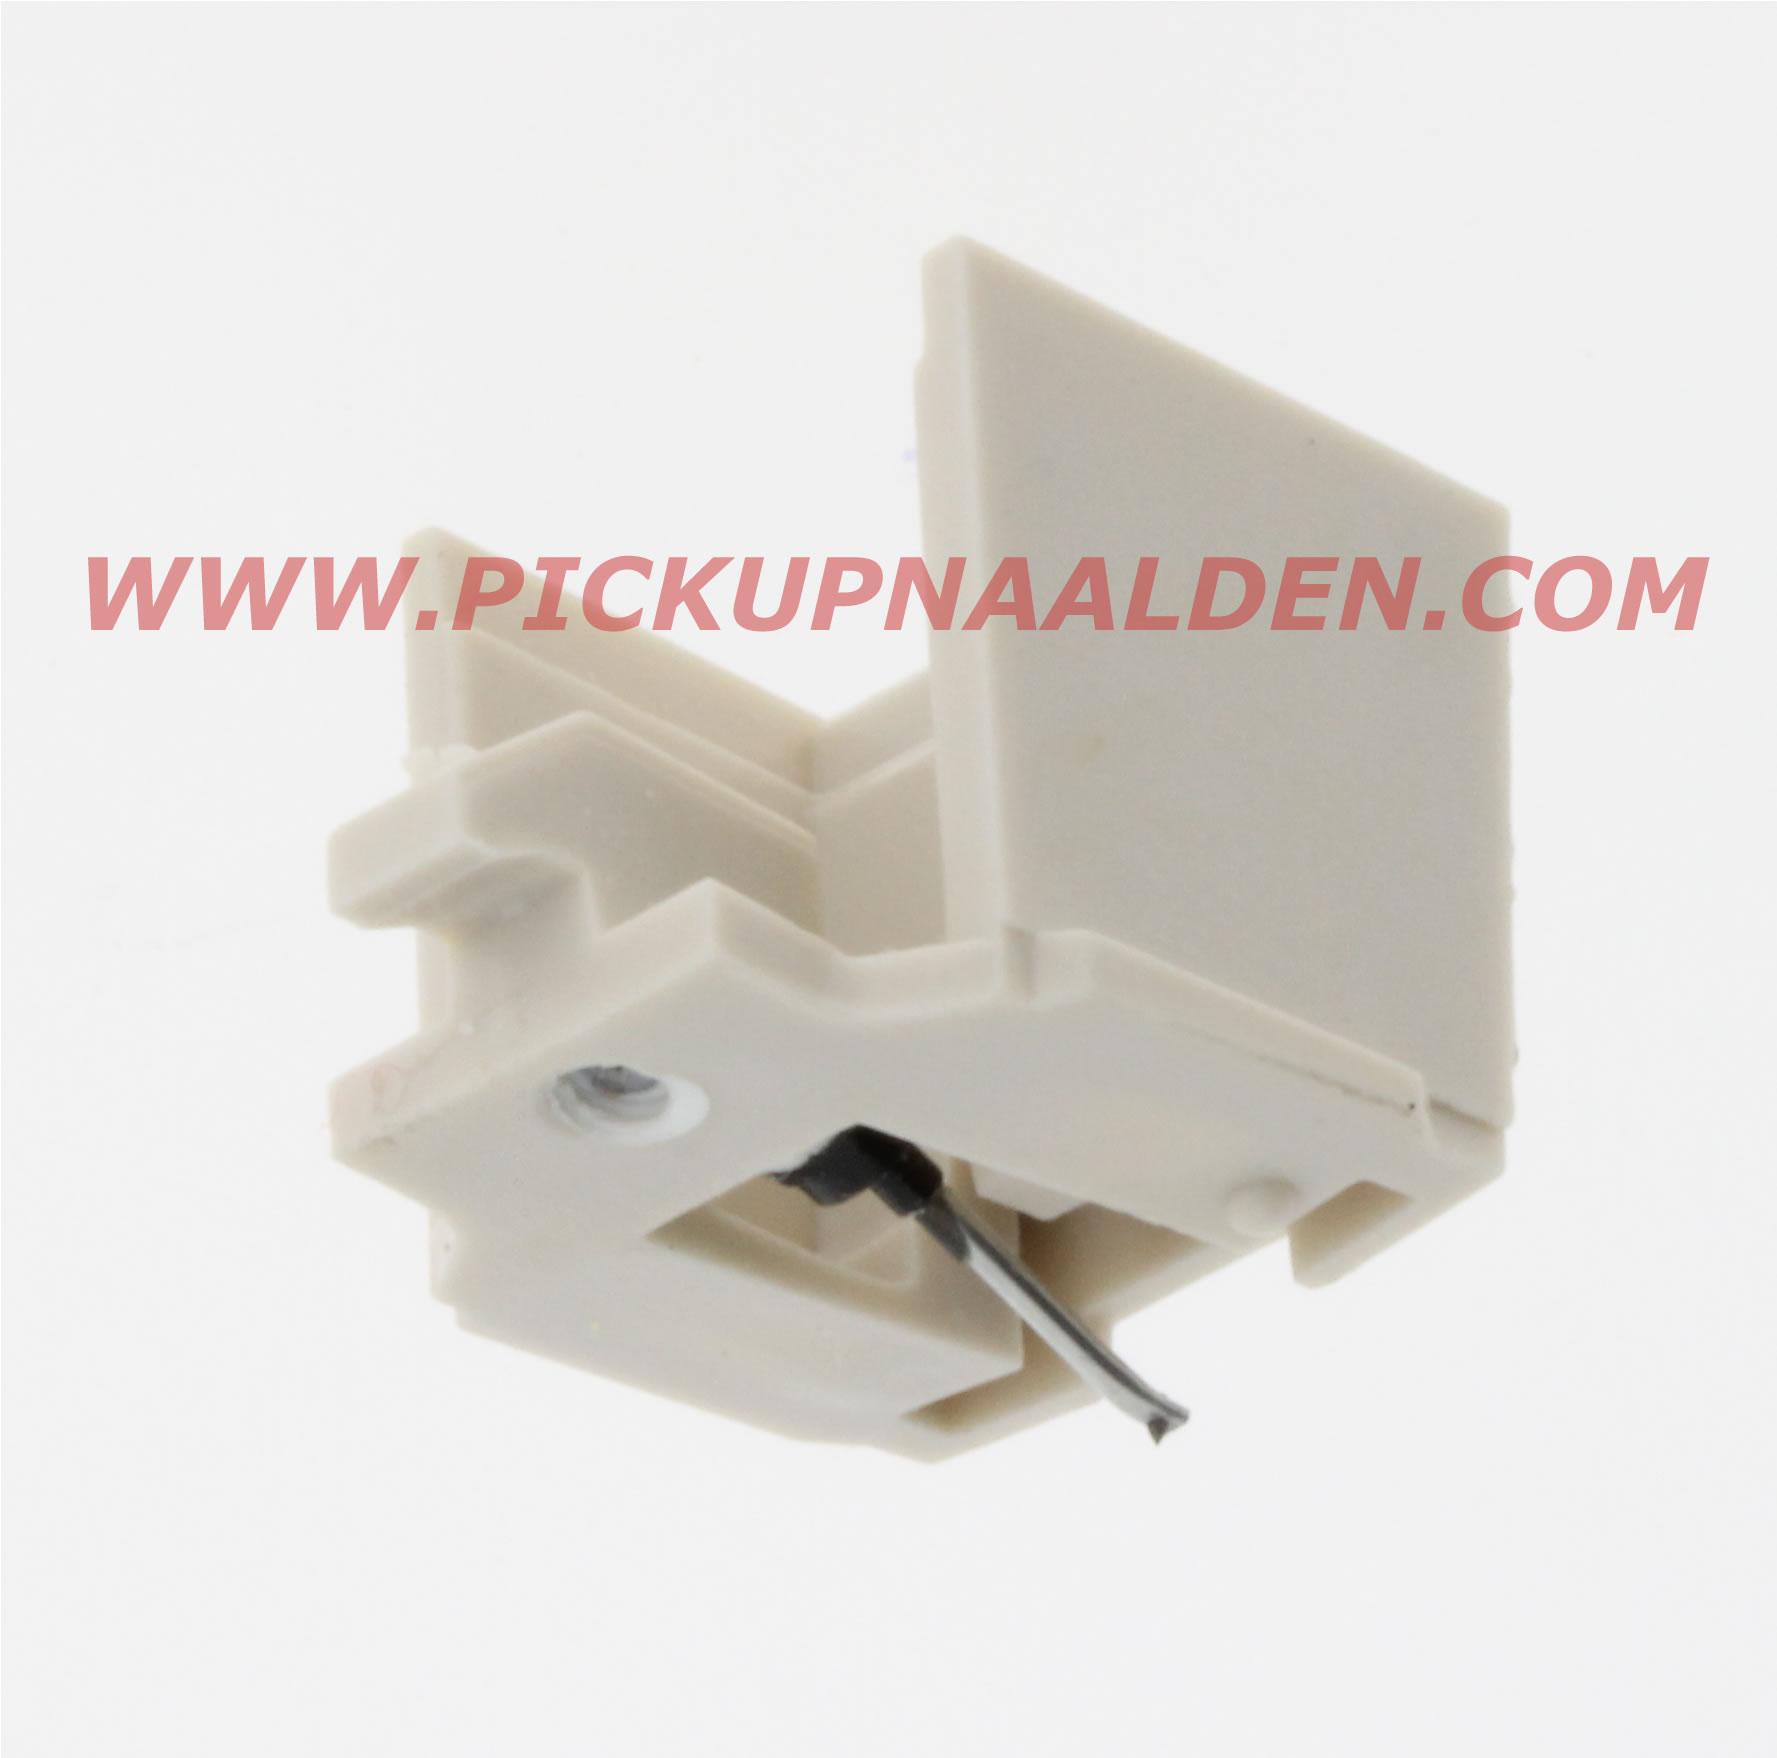 ATN-3600C Turntable Stylus Needle Audio Technica ATN-3600 ATN-3601, ATN-3600L